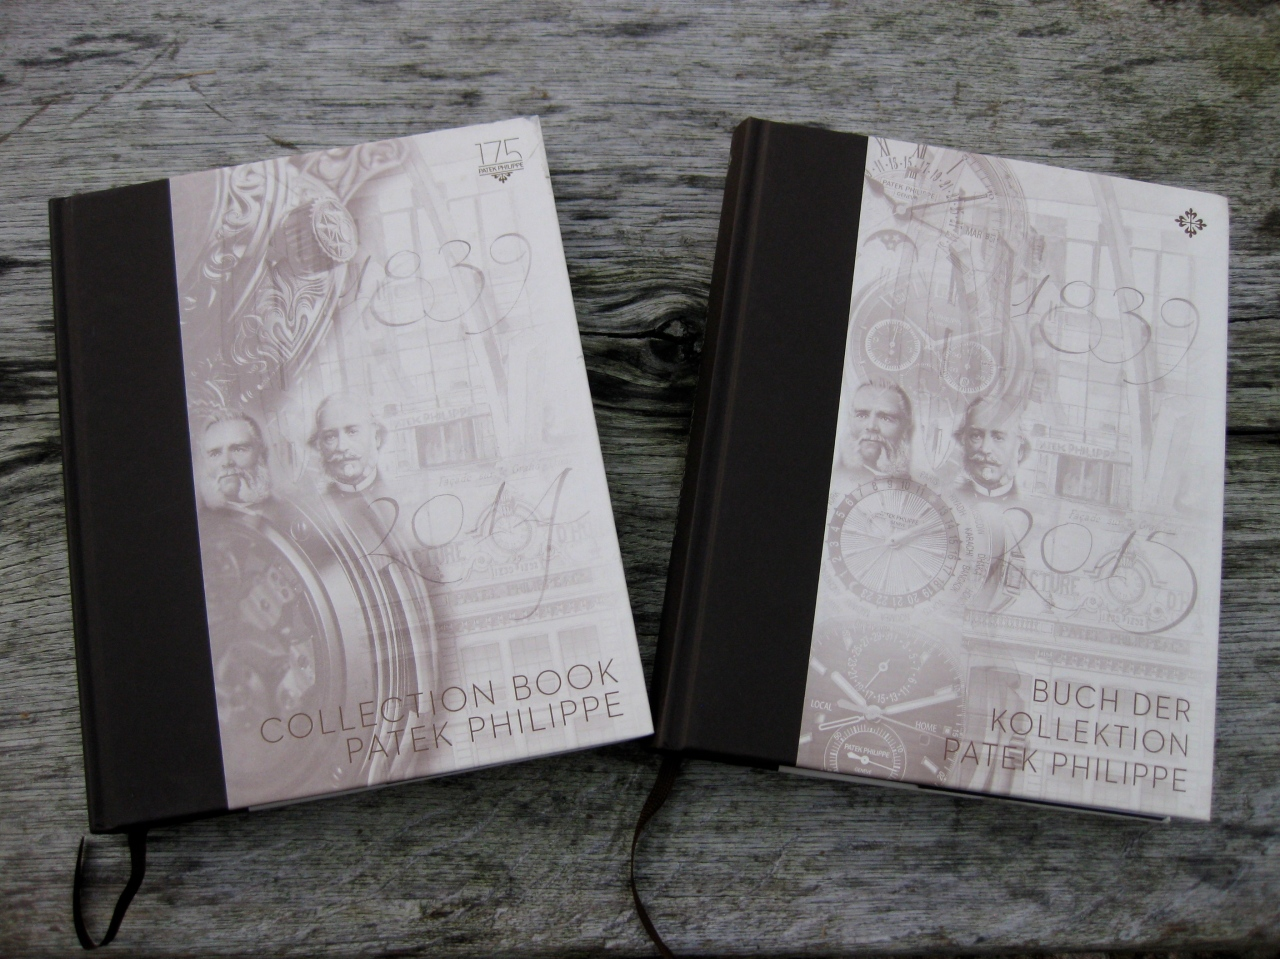 Patek Philippe – Buch der Kollektion Volume I &II